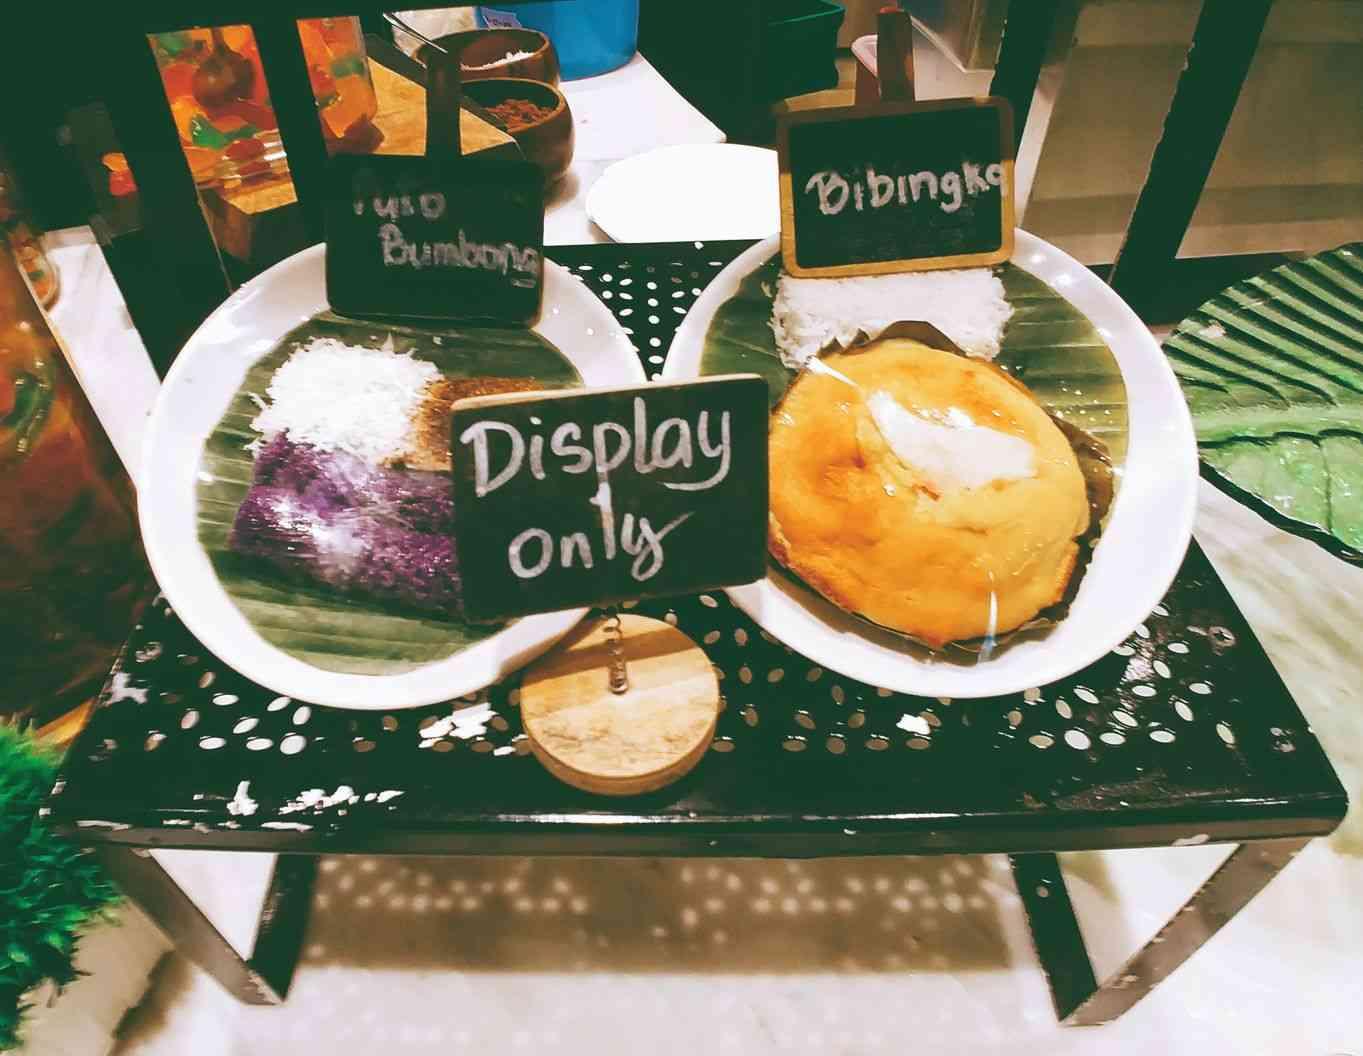 Vikings Luxury Buffet: bibingka and puto bumbong